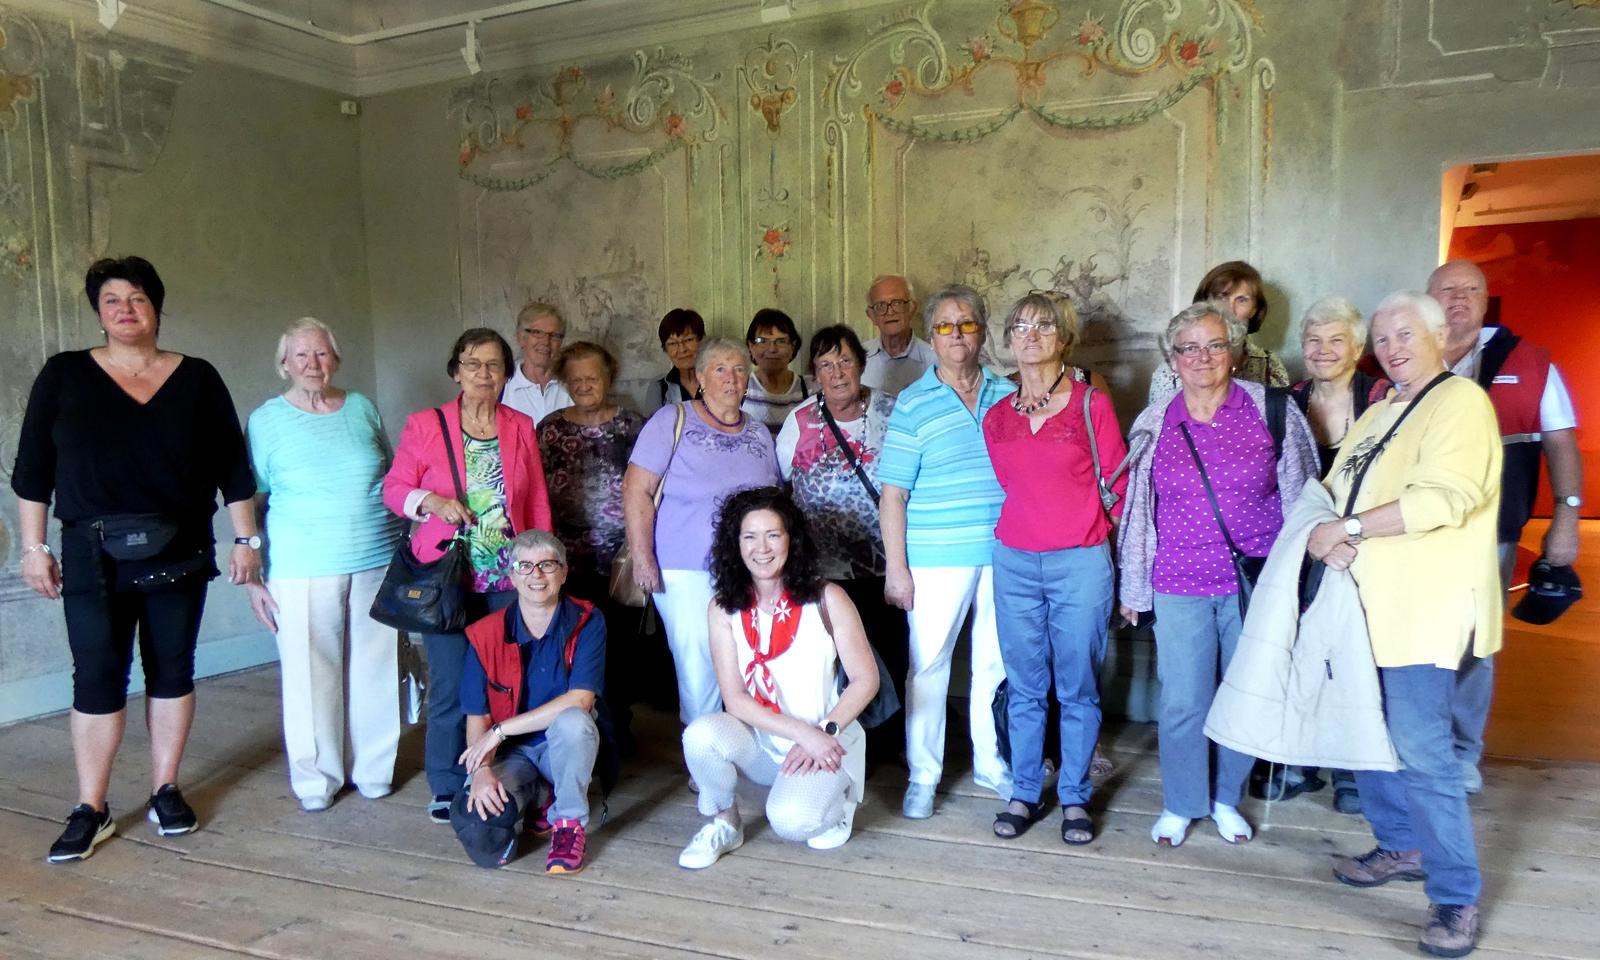 Ausflug_Schloss-Wolfstein_Rosmarie-Krenn_bearb